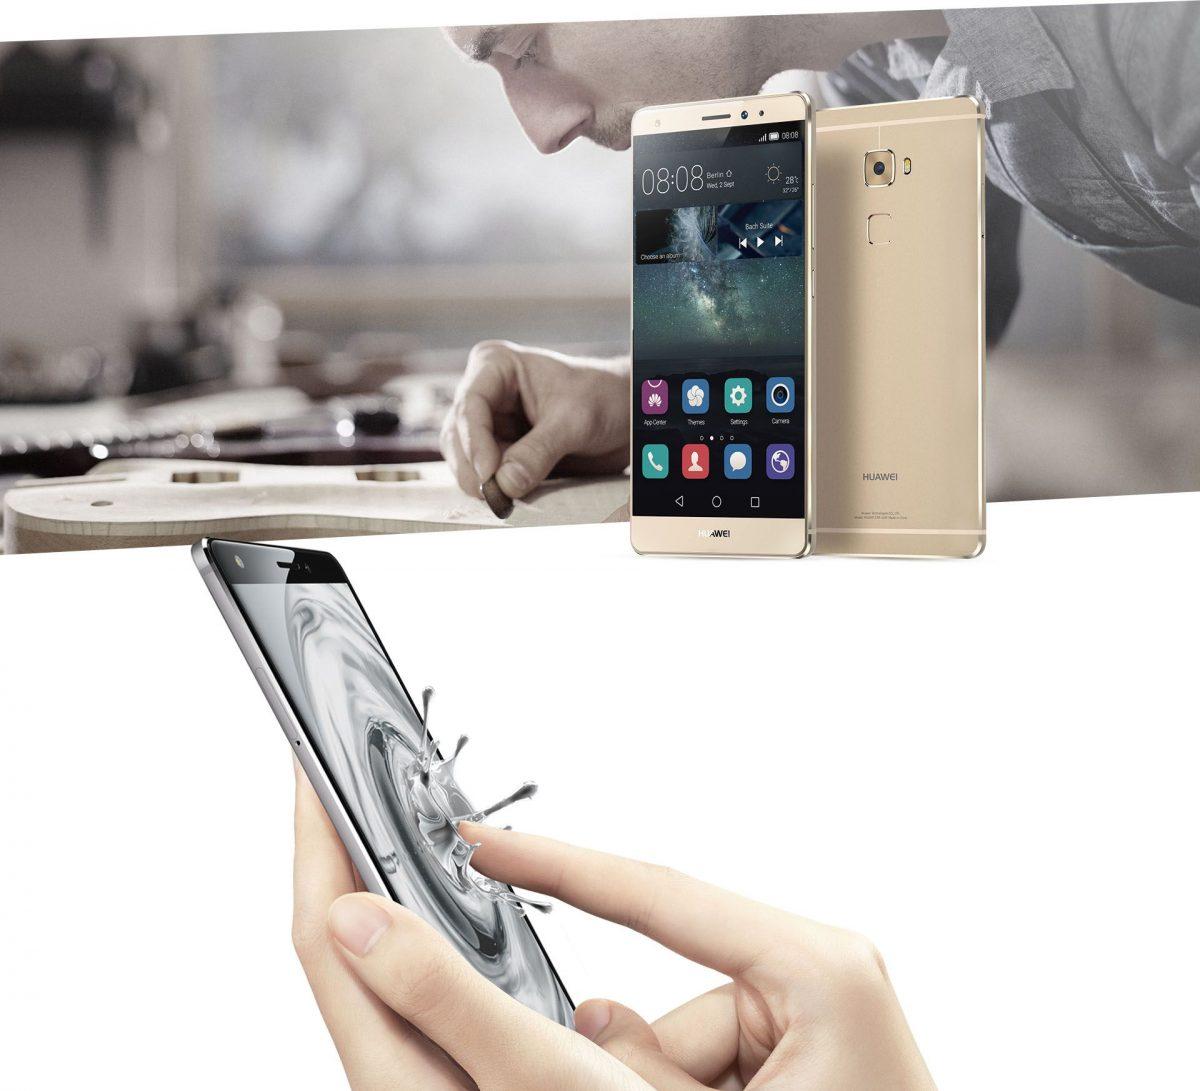 IFA2015: Huawei stellt das neue Flaggschiff Smartphone Ascend Mate S vor 4